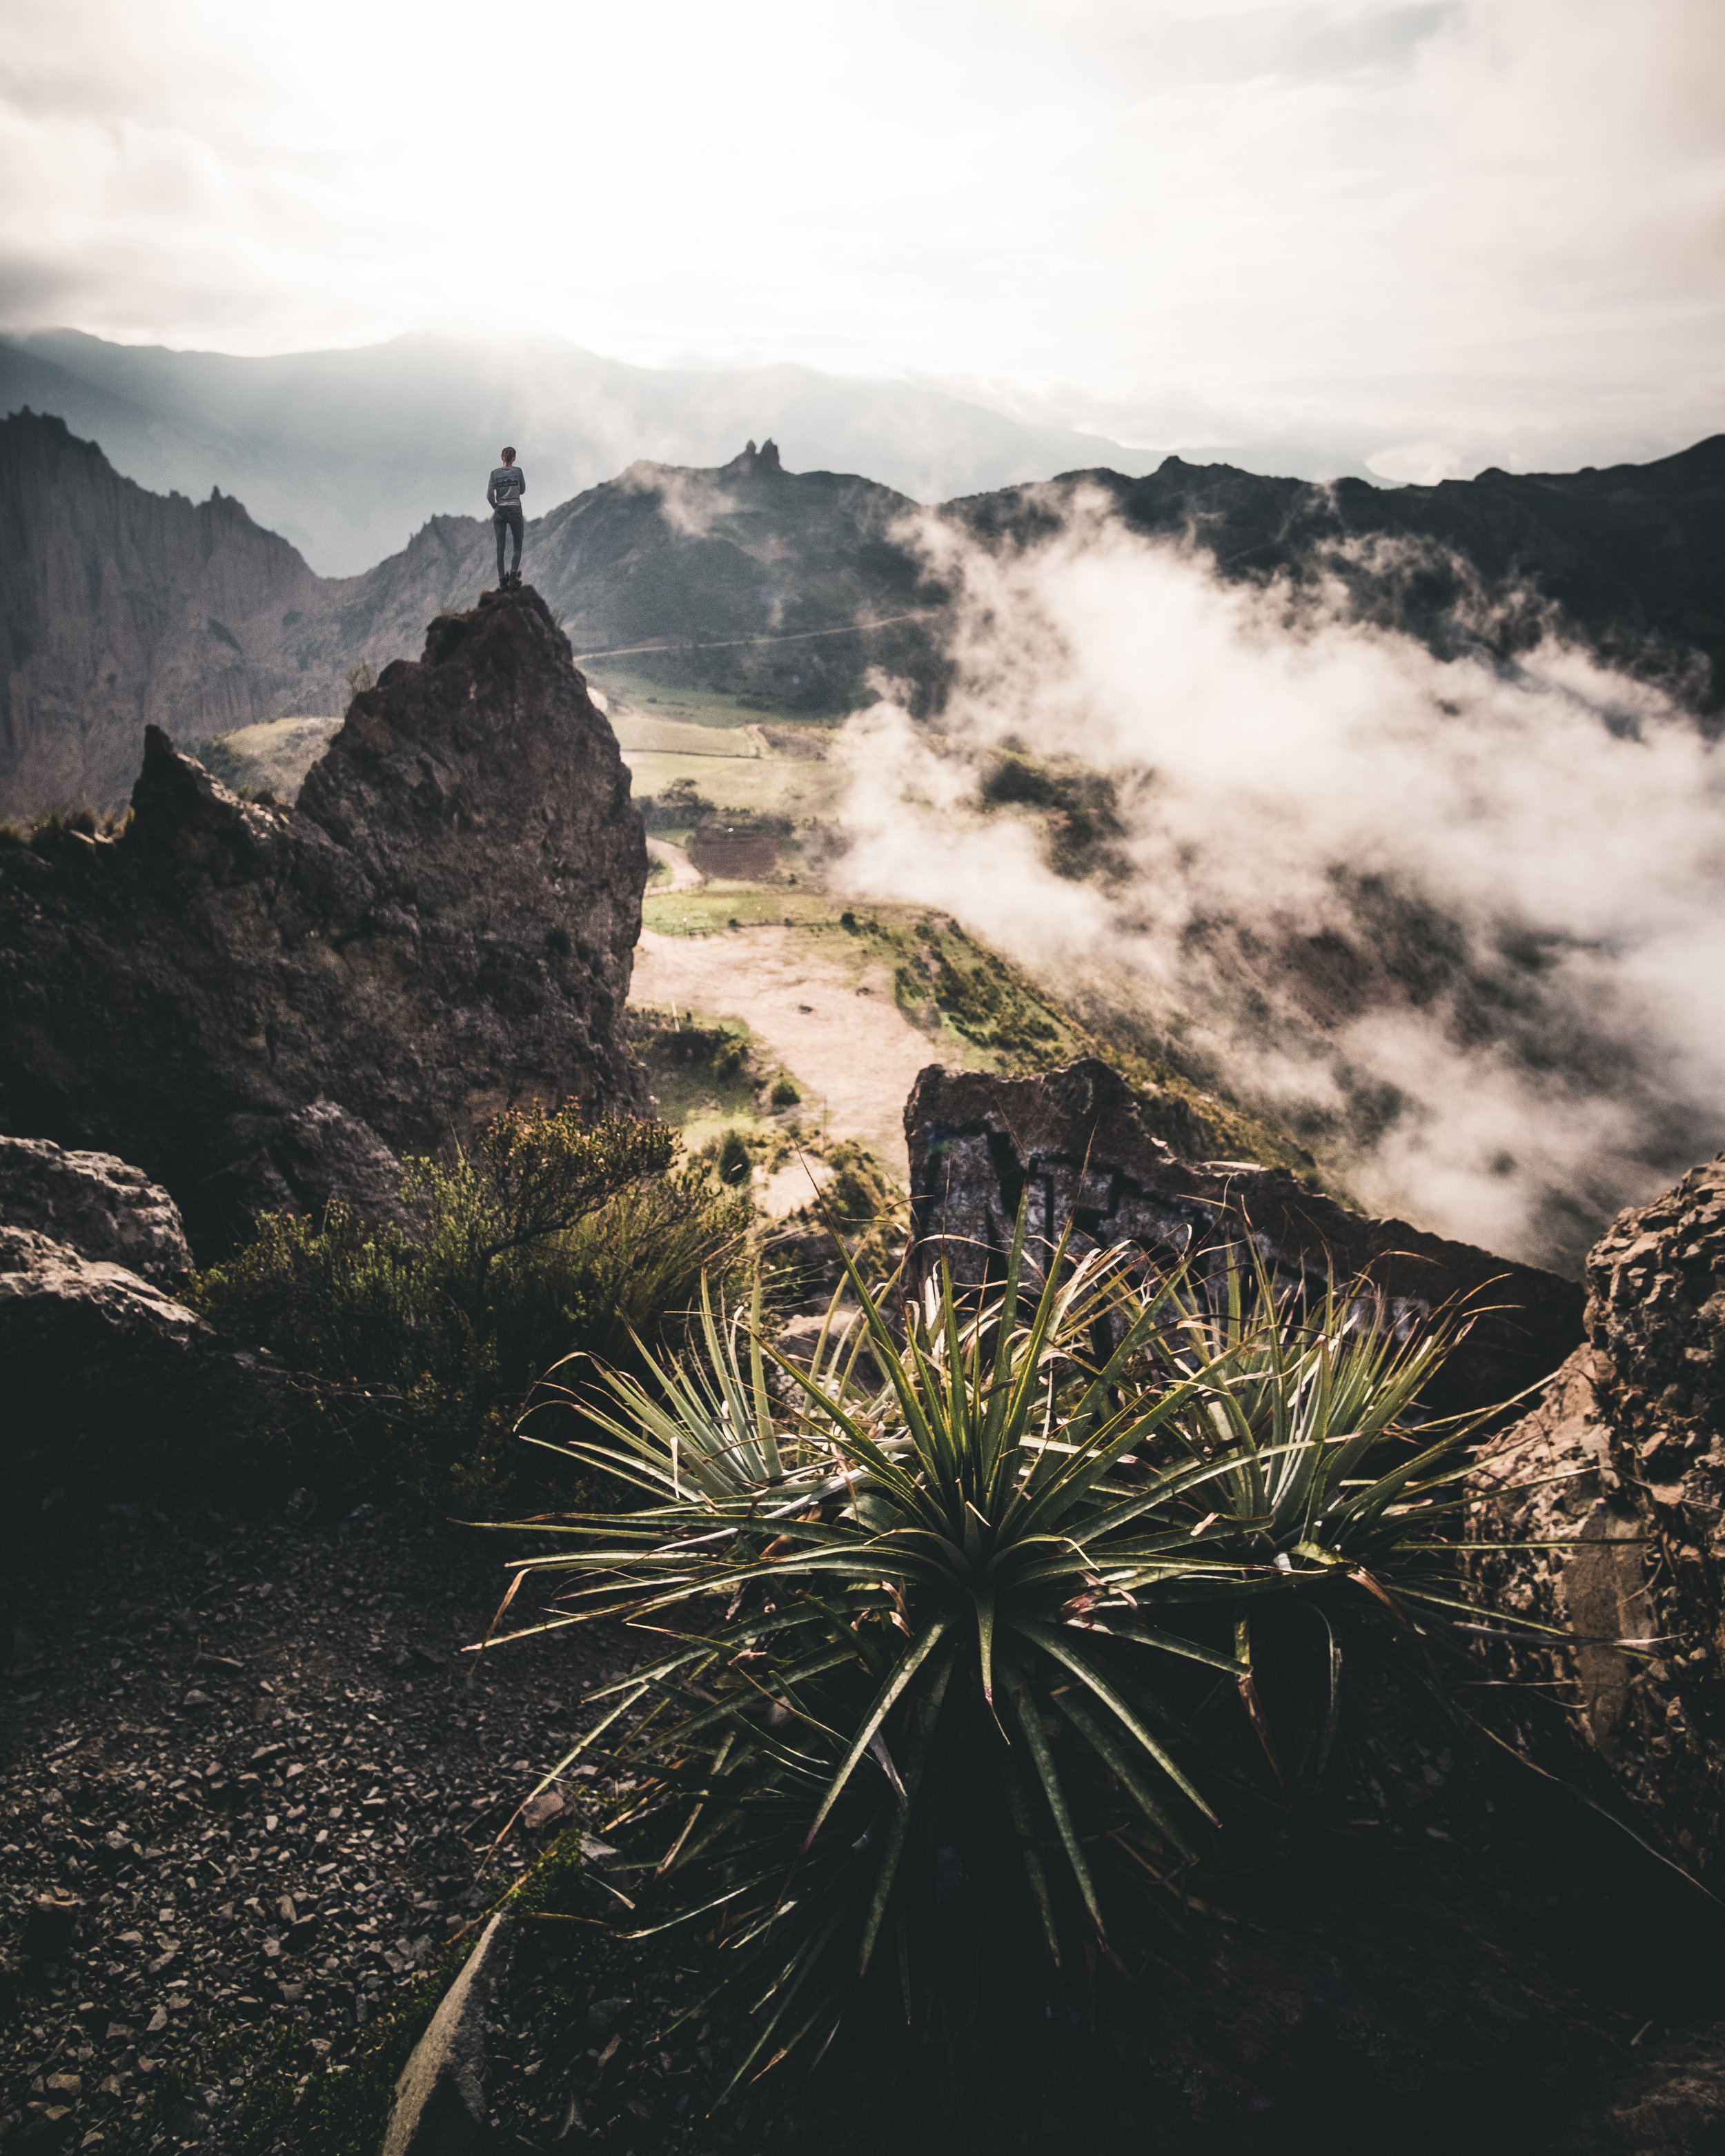 Sunrise on top of Muela del Diablo | La Paz